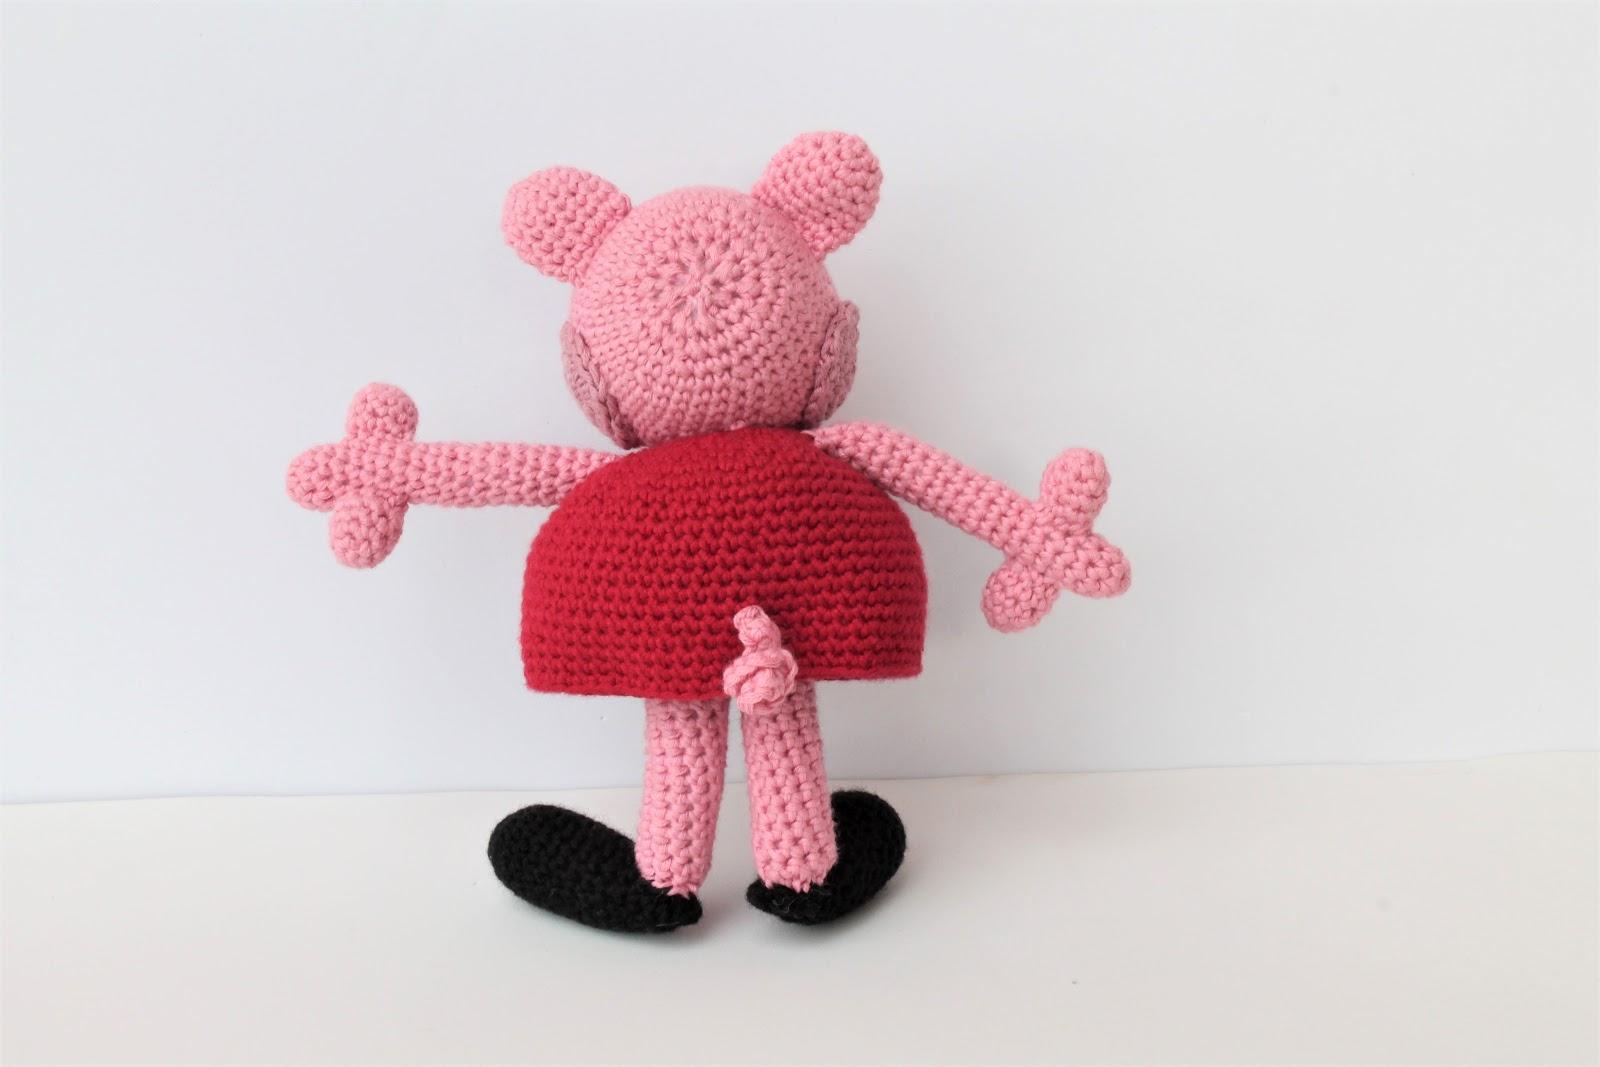 Peppa Pig Amigurumi Taller De Mao : matemo: Peppa Pig amigurumi